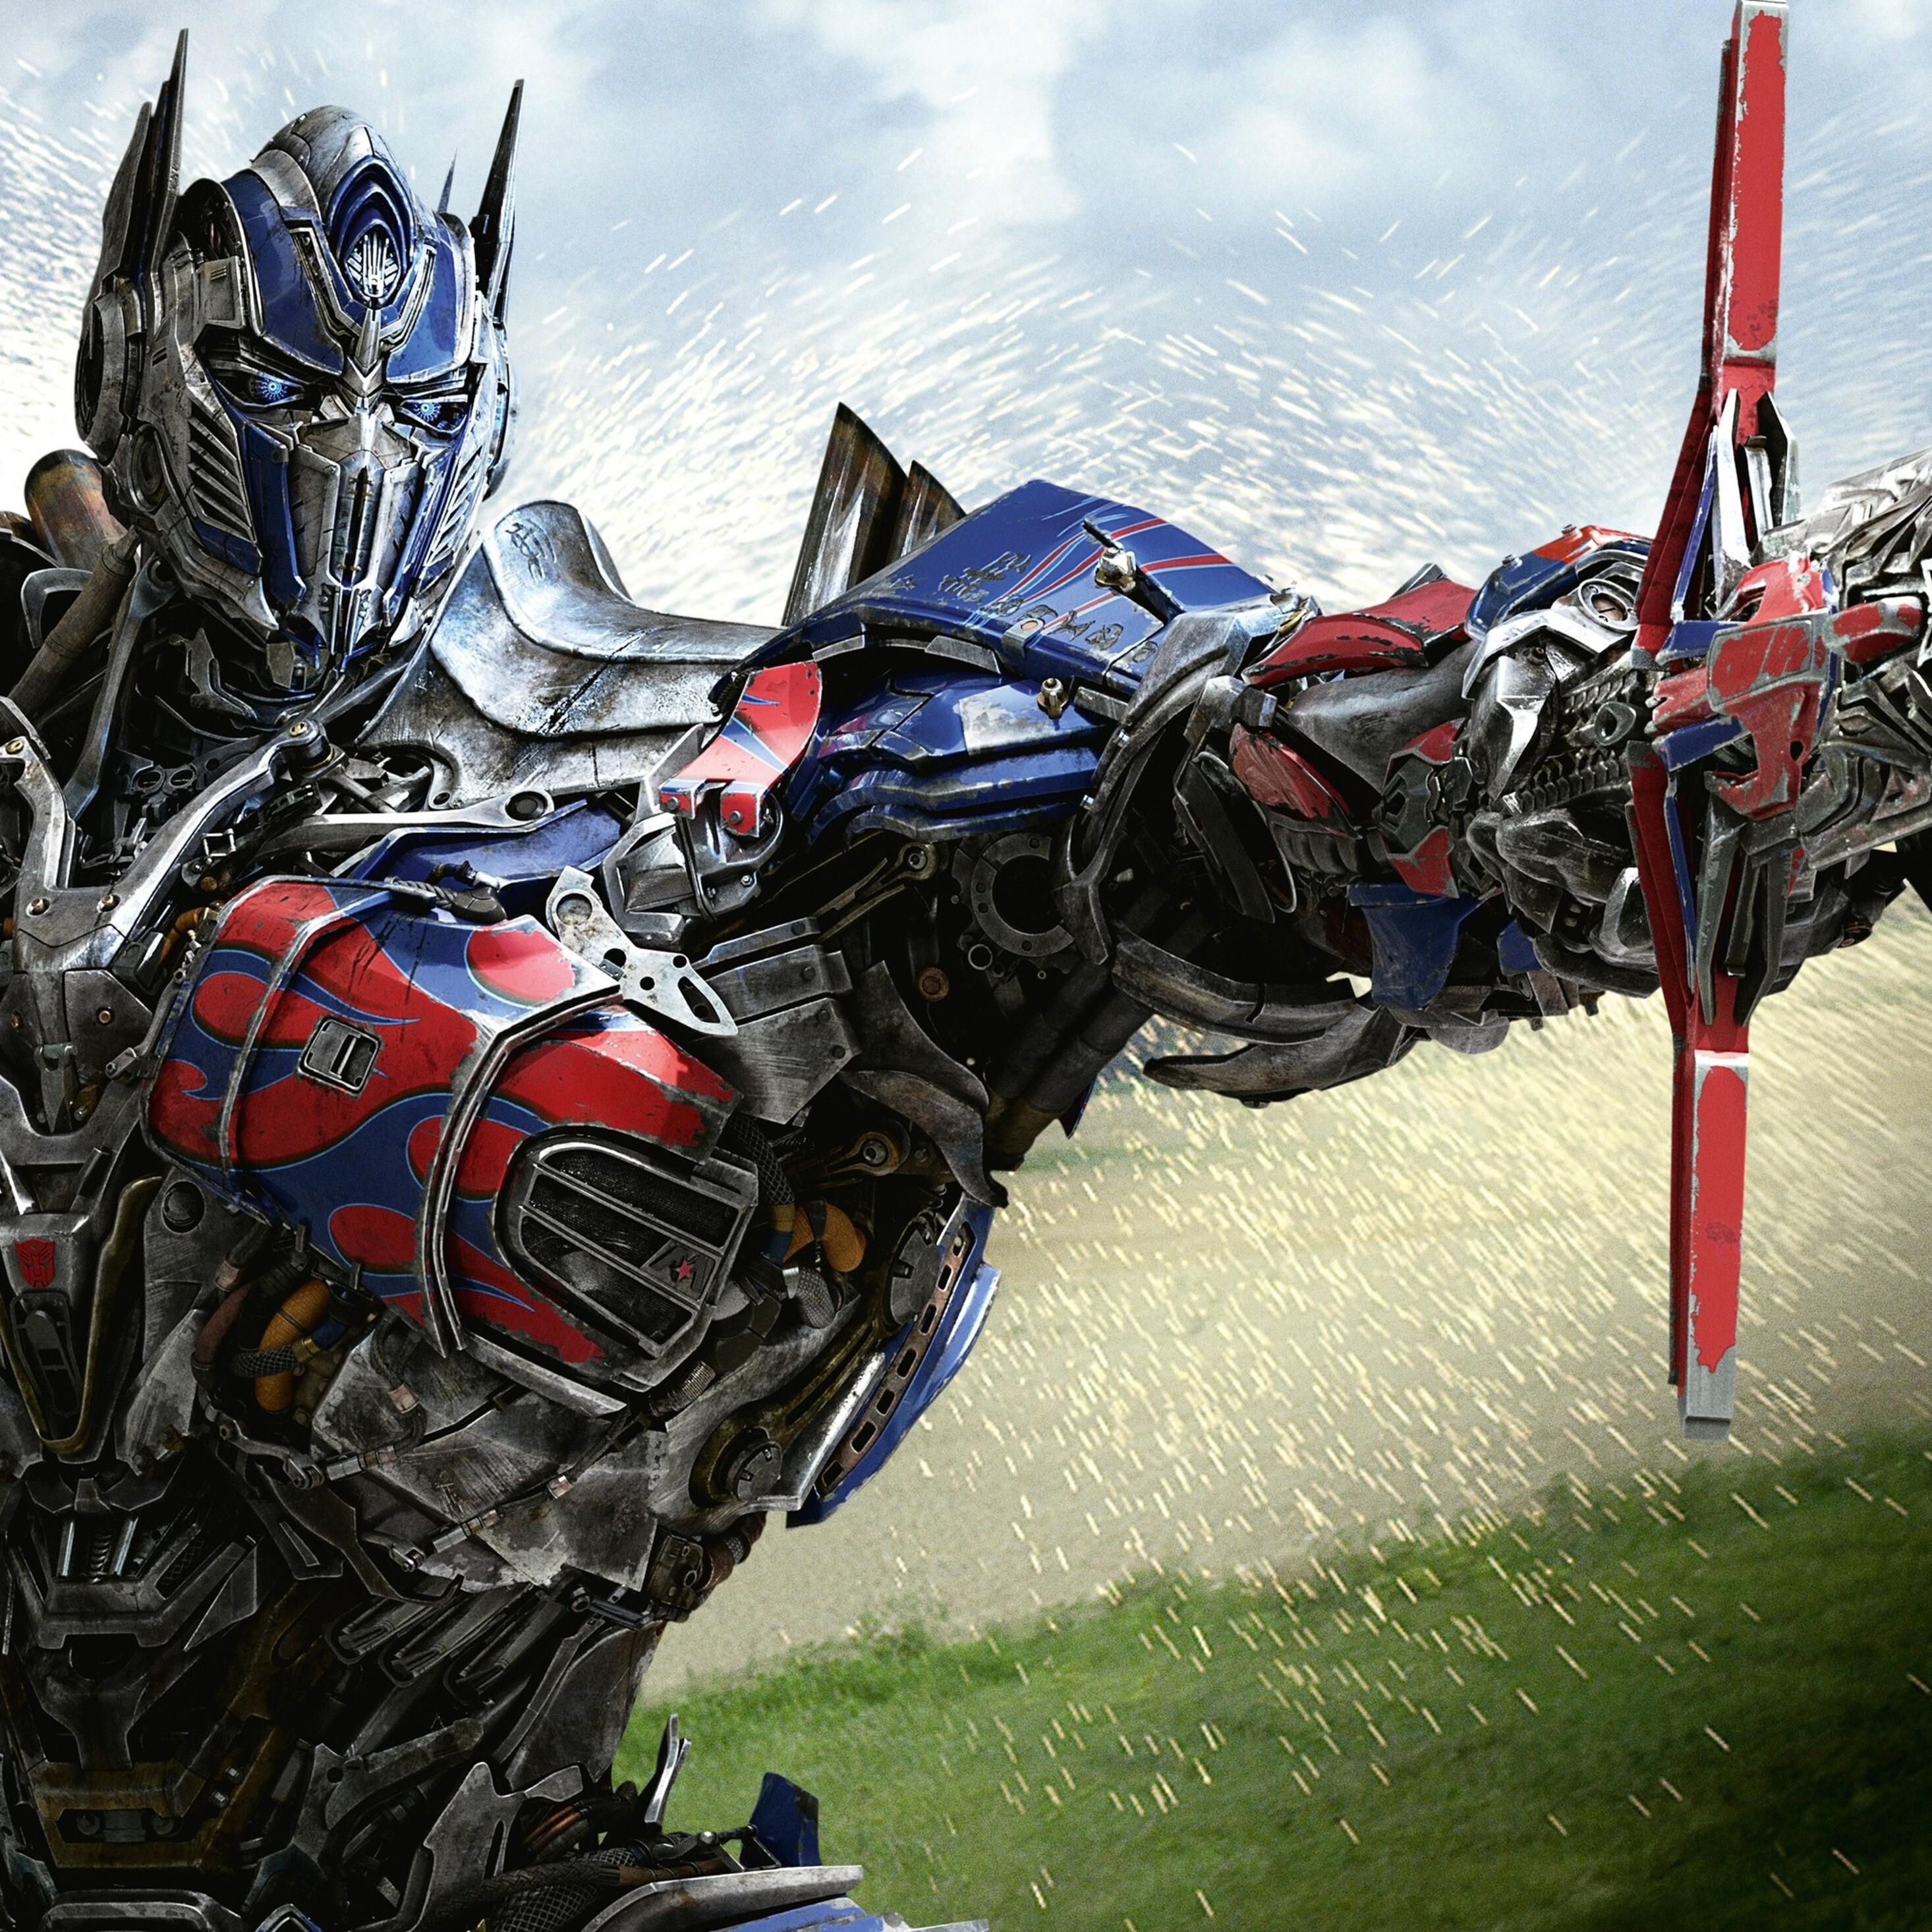 Optimus Prime Wallpaper Hd: 2932x2932 Optimus Prime In Transformers 4 Age Of